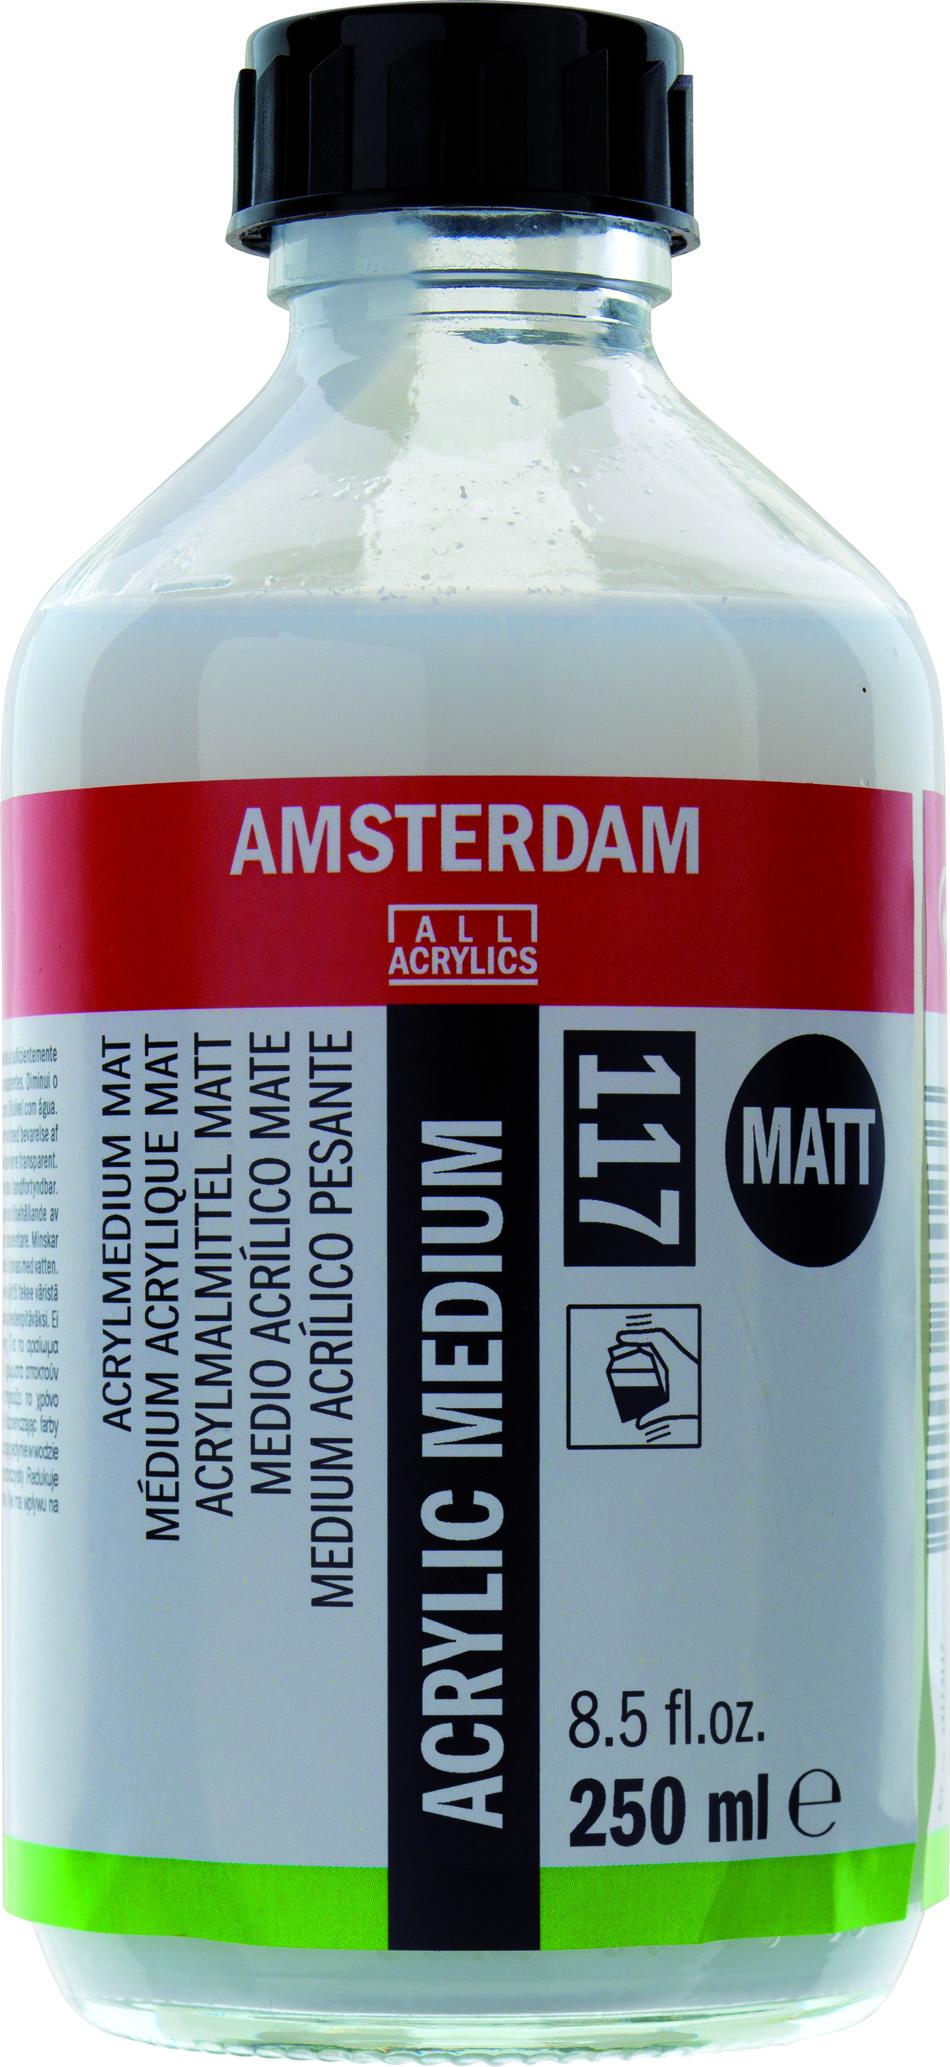 AMSTERDAM ACRYLIC MEDIUM MATT 117 250 ML